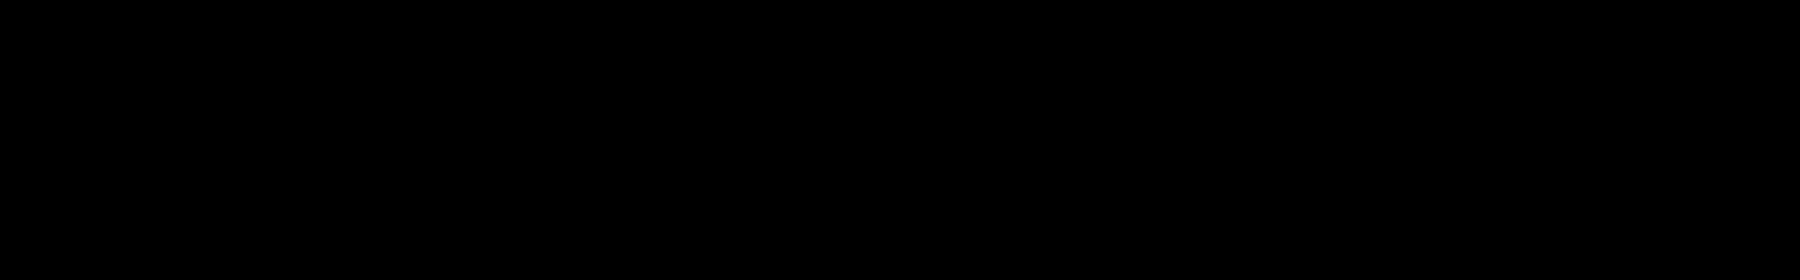 Neuro Dropz audio waveform